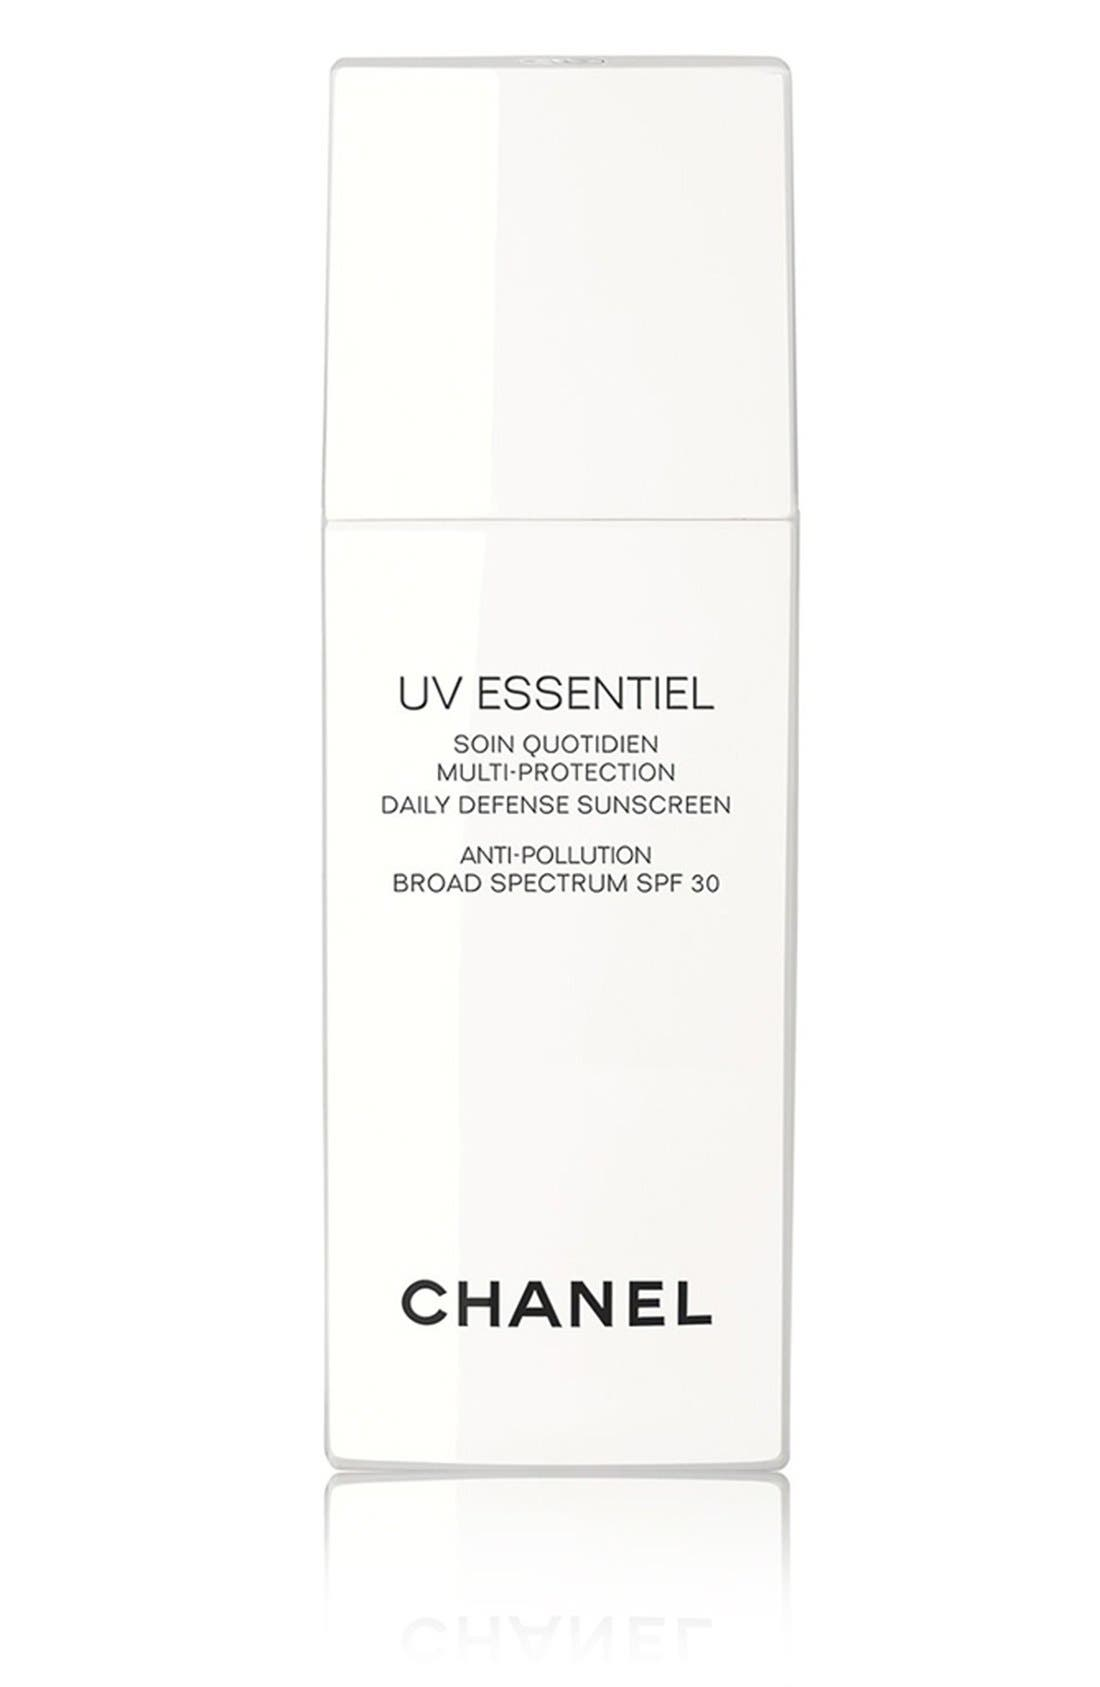 UV ESSENTIEL<br />Multi-Protection Daily Defense Sunscreen Anti-Pollution Broad Spectrum SPF 30,                         Main,                         color, 000